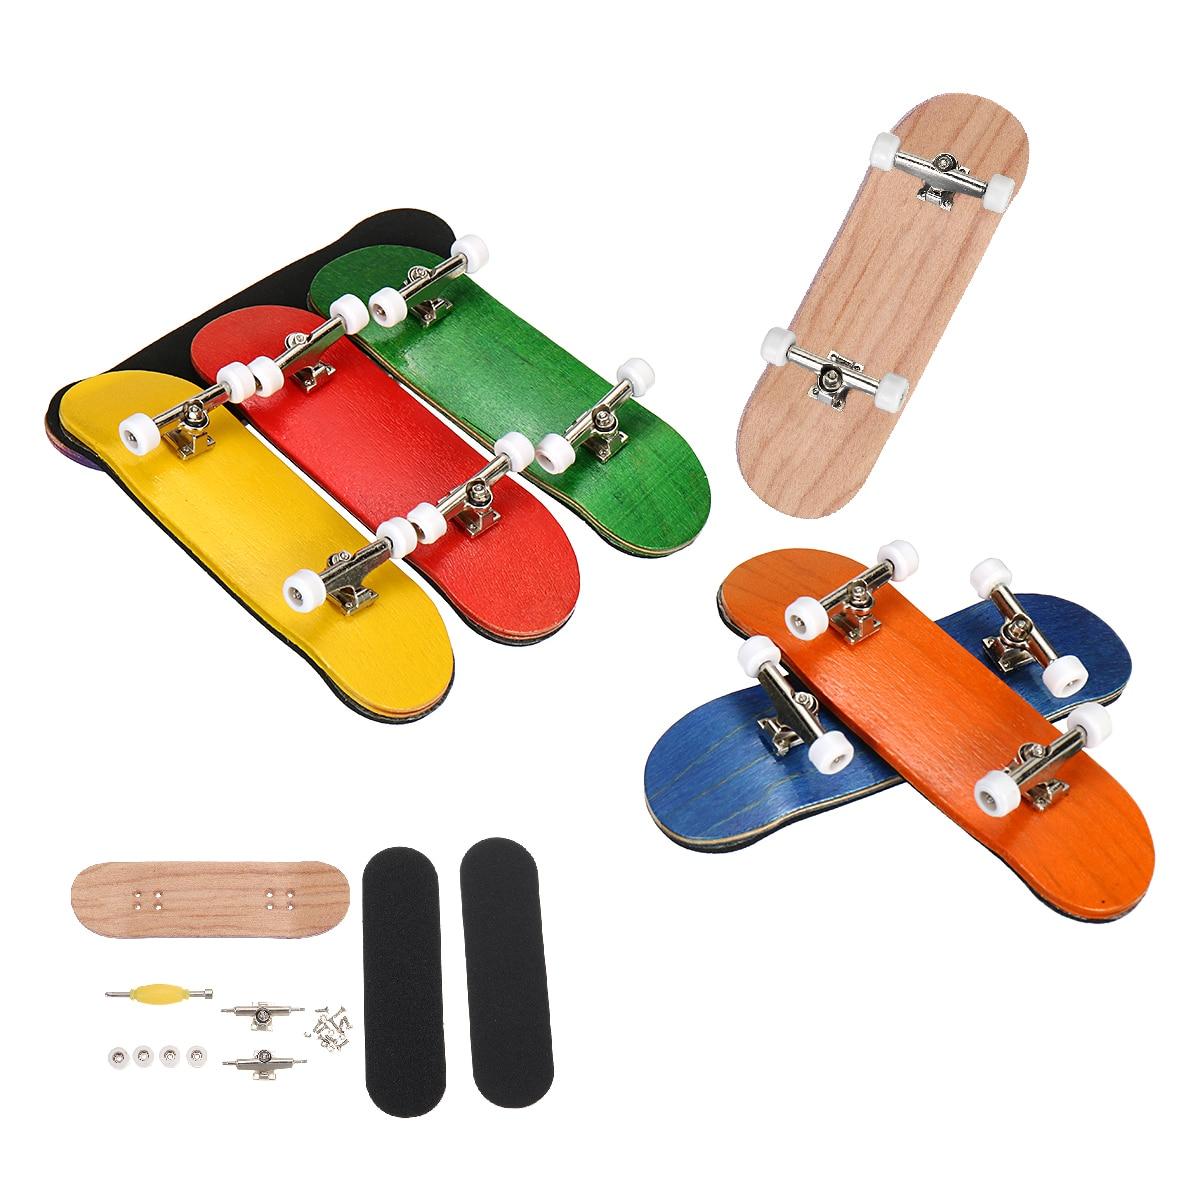 Wooden Fingerboard Skateboard Children Deck Sport Game Gift Maple Finger Toy For Adults Kids